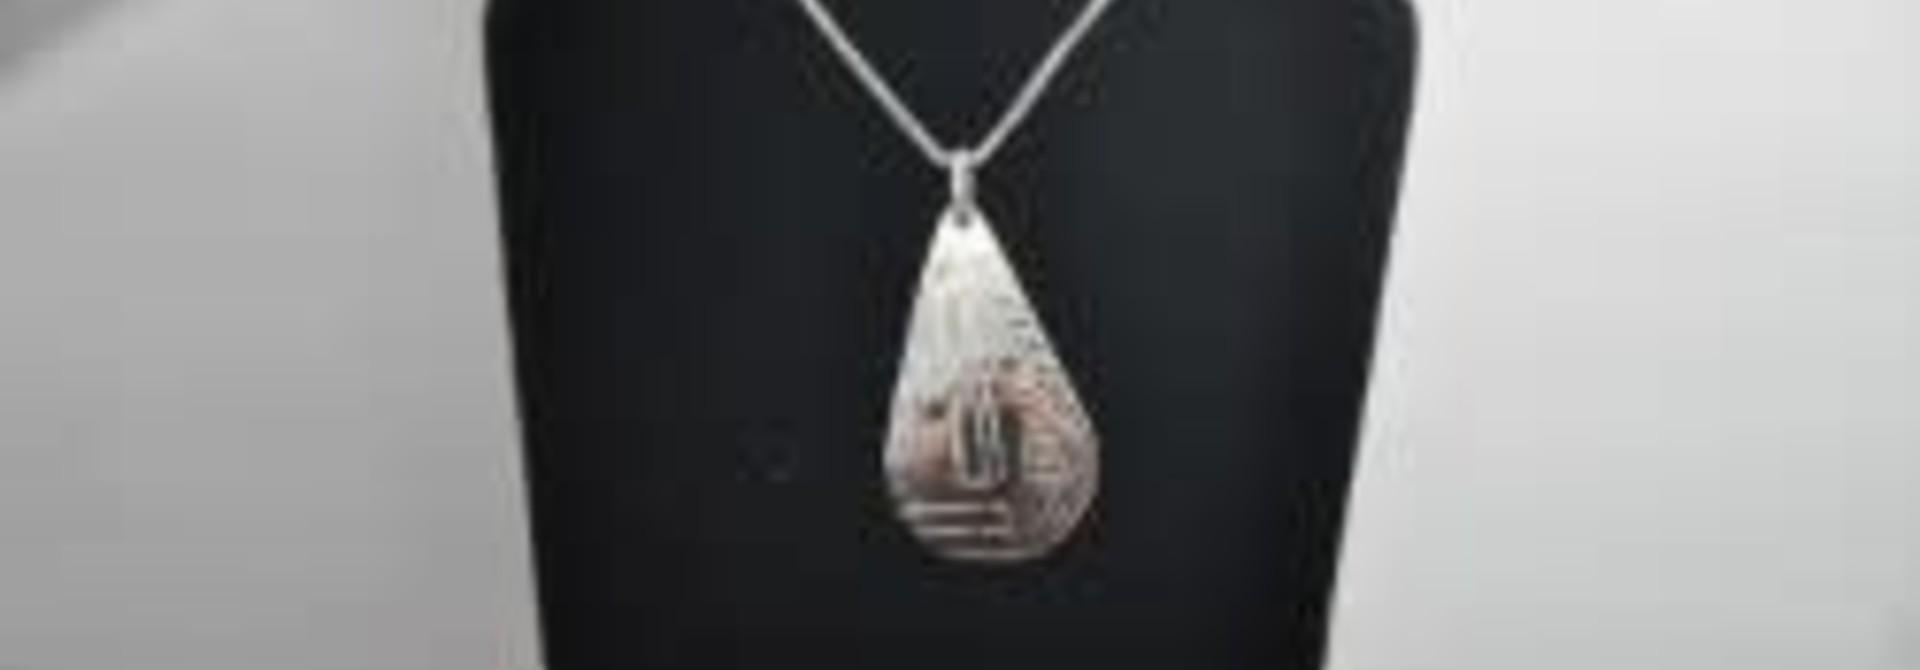 Silver Carved Raven Pendant by Vincent Henson